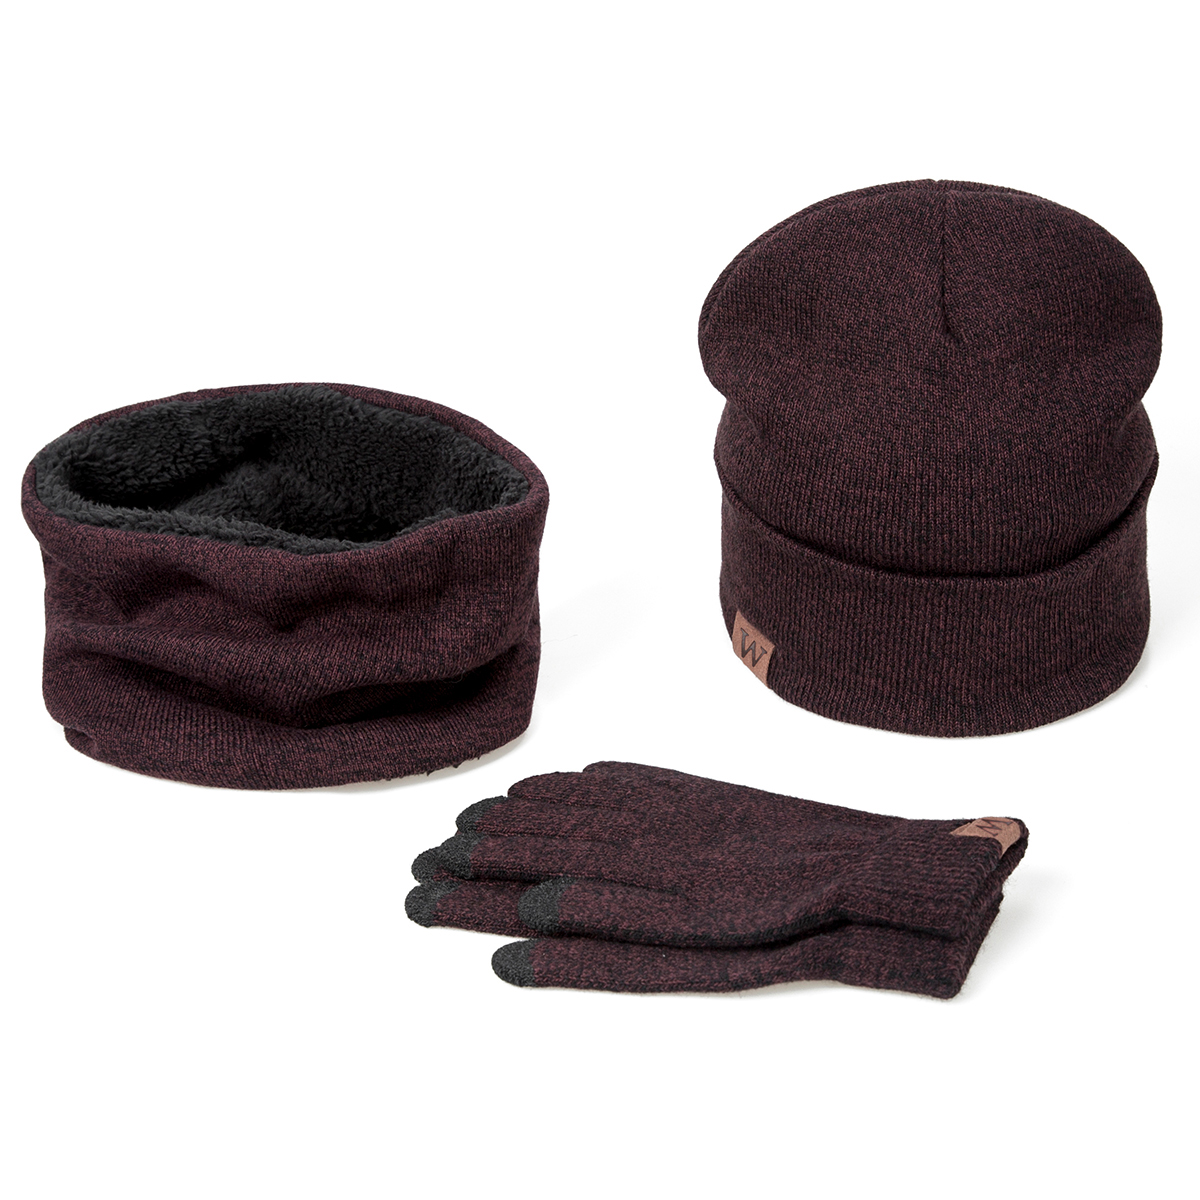 YEABIU, зимняя женская шапка, шарф, перчатки, набор, теплые, для девушек, Skullies Beanies, шапка, Infinity, для мужчин, шапка с сенсорным экраном, перчатки, набор для женщин - Цвет: wine red